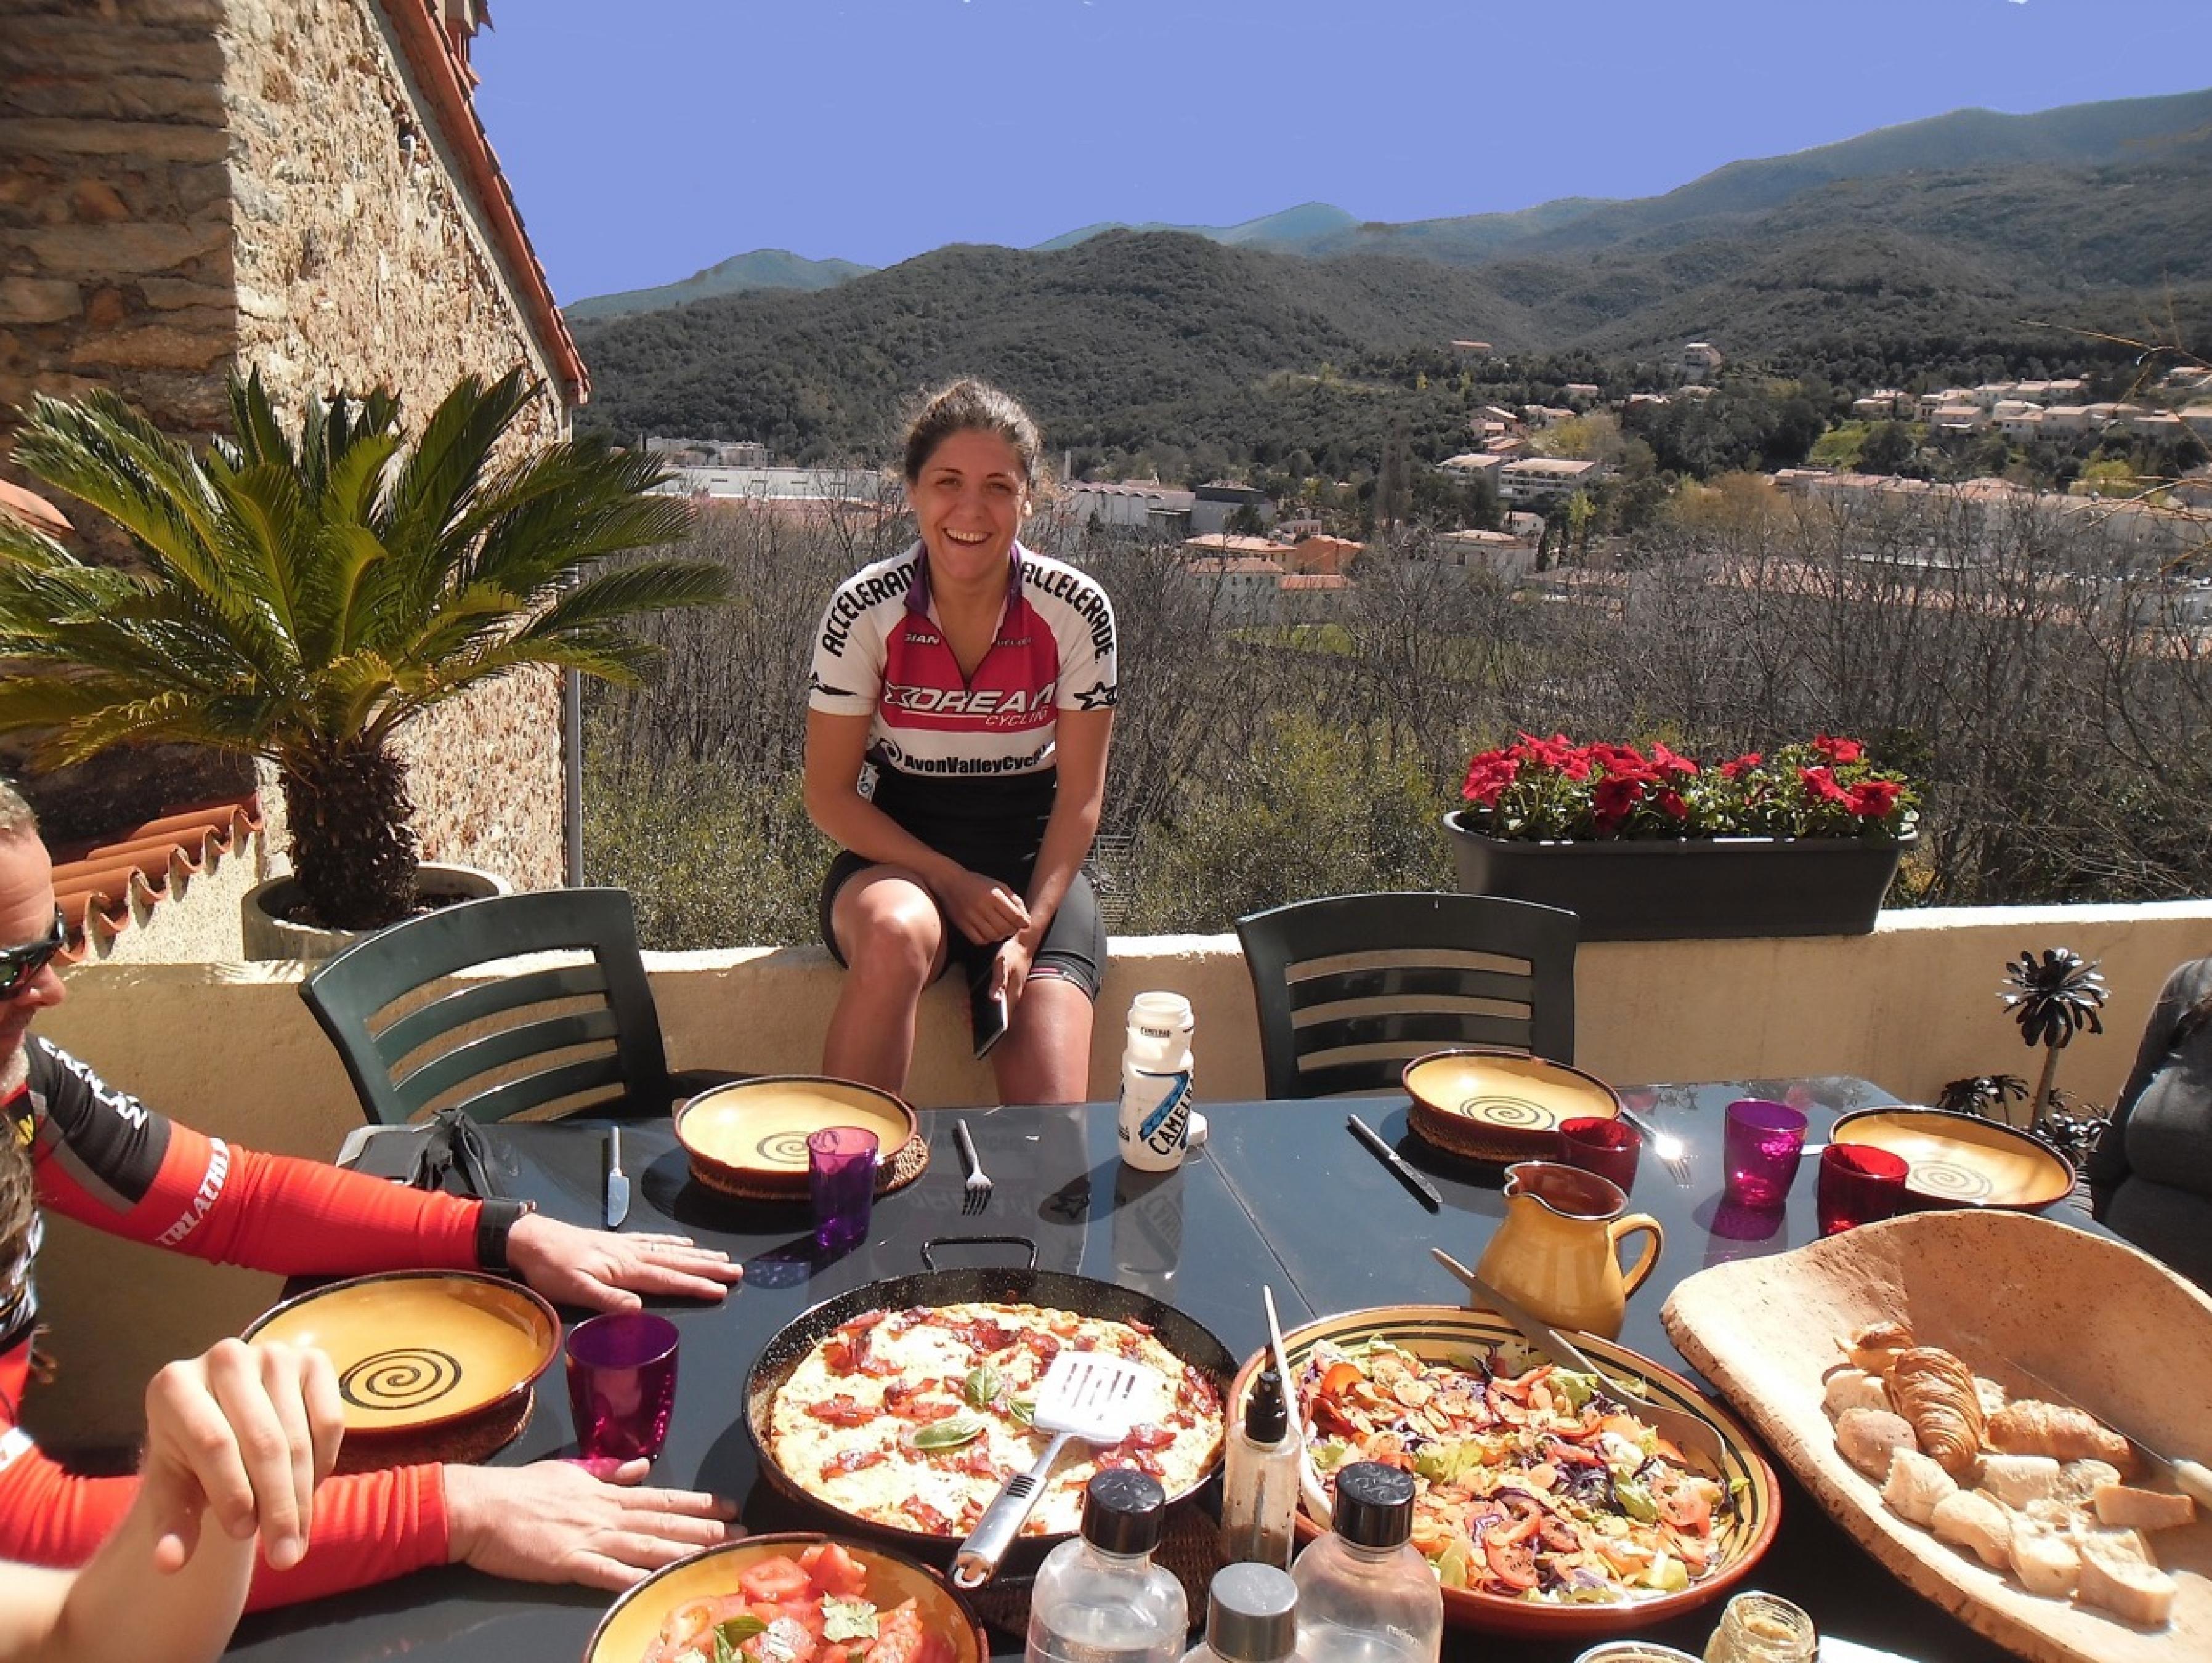 Lunch on the Terrace Sancture Sportifs